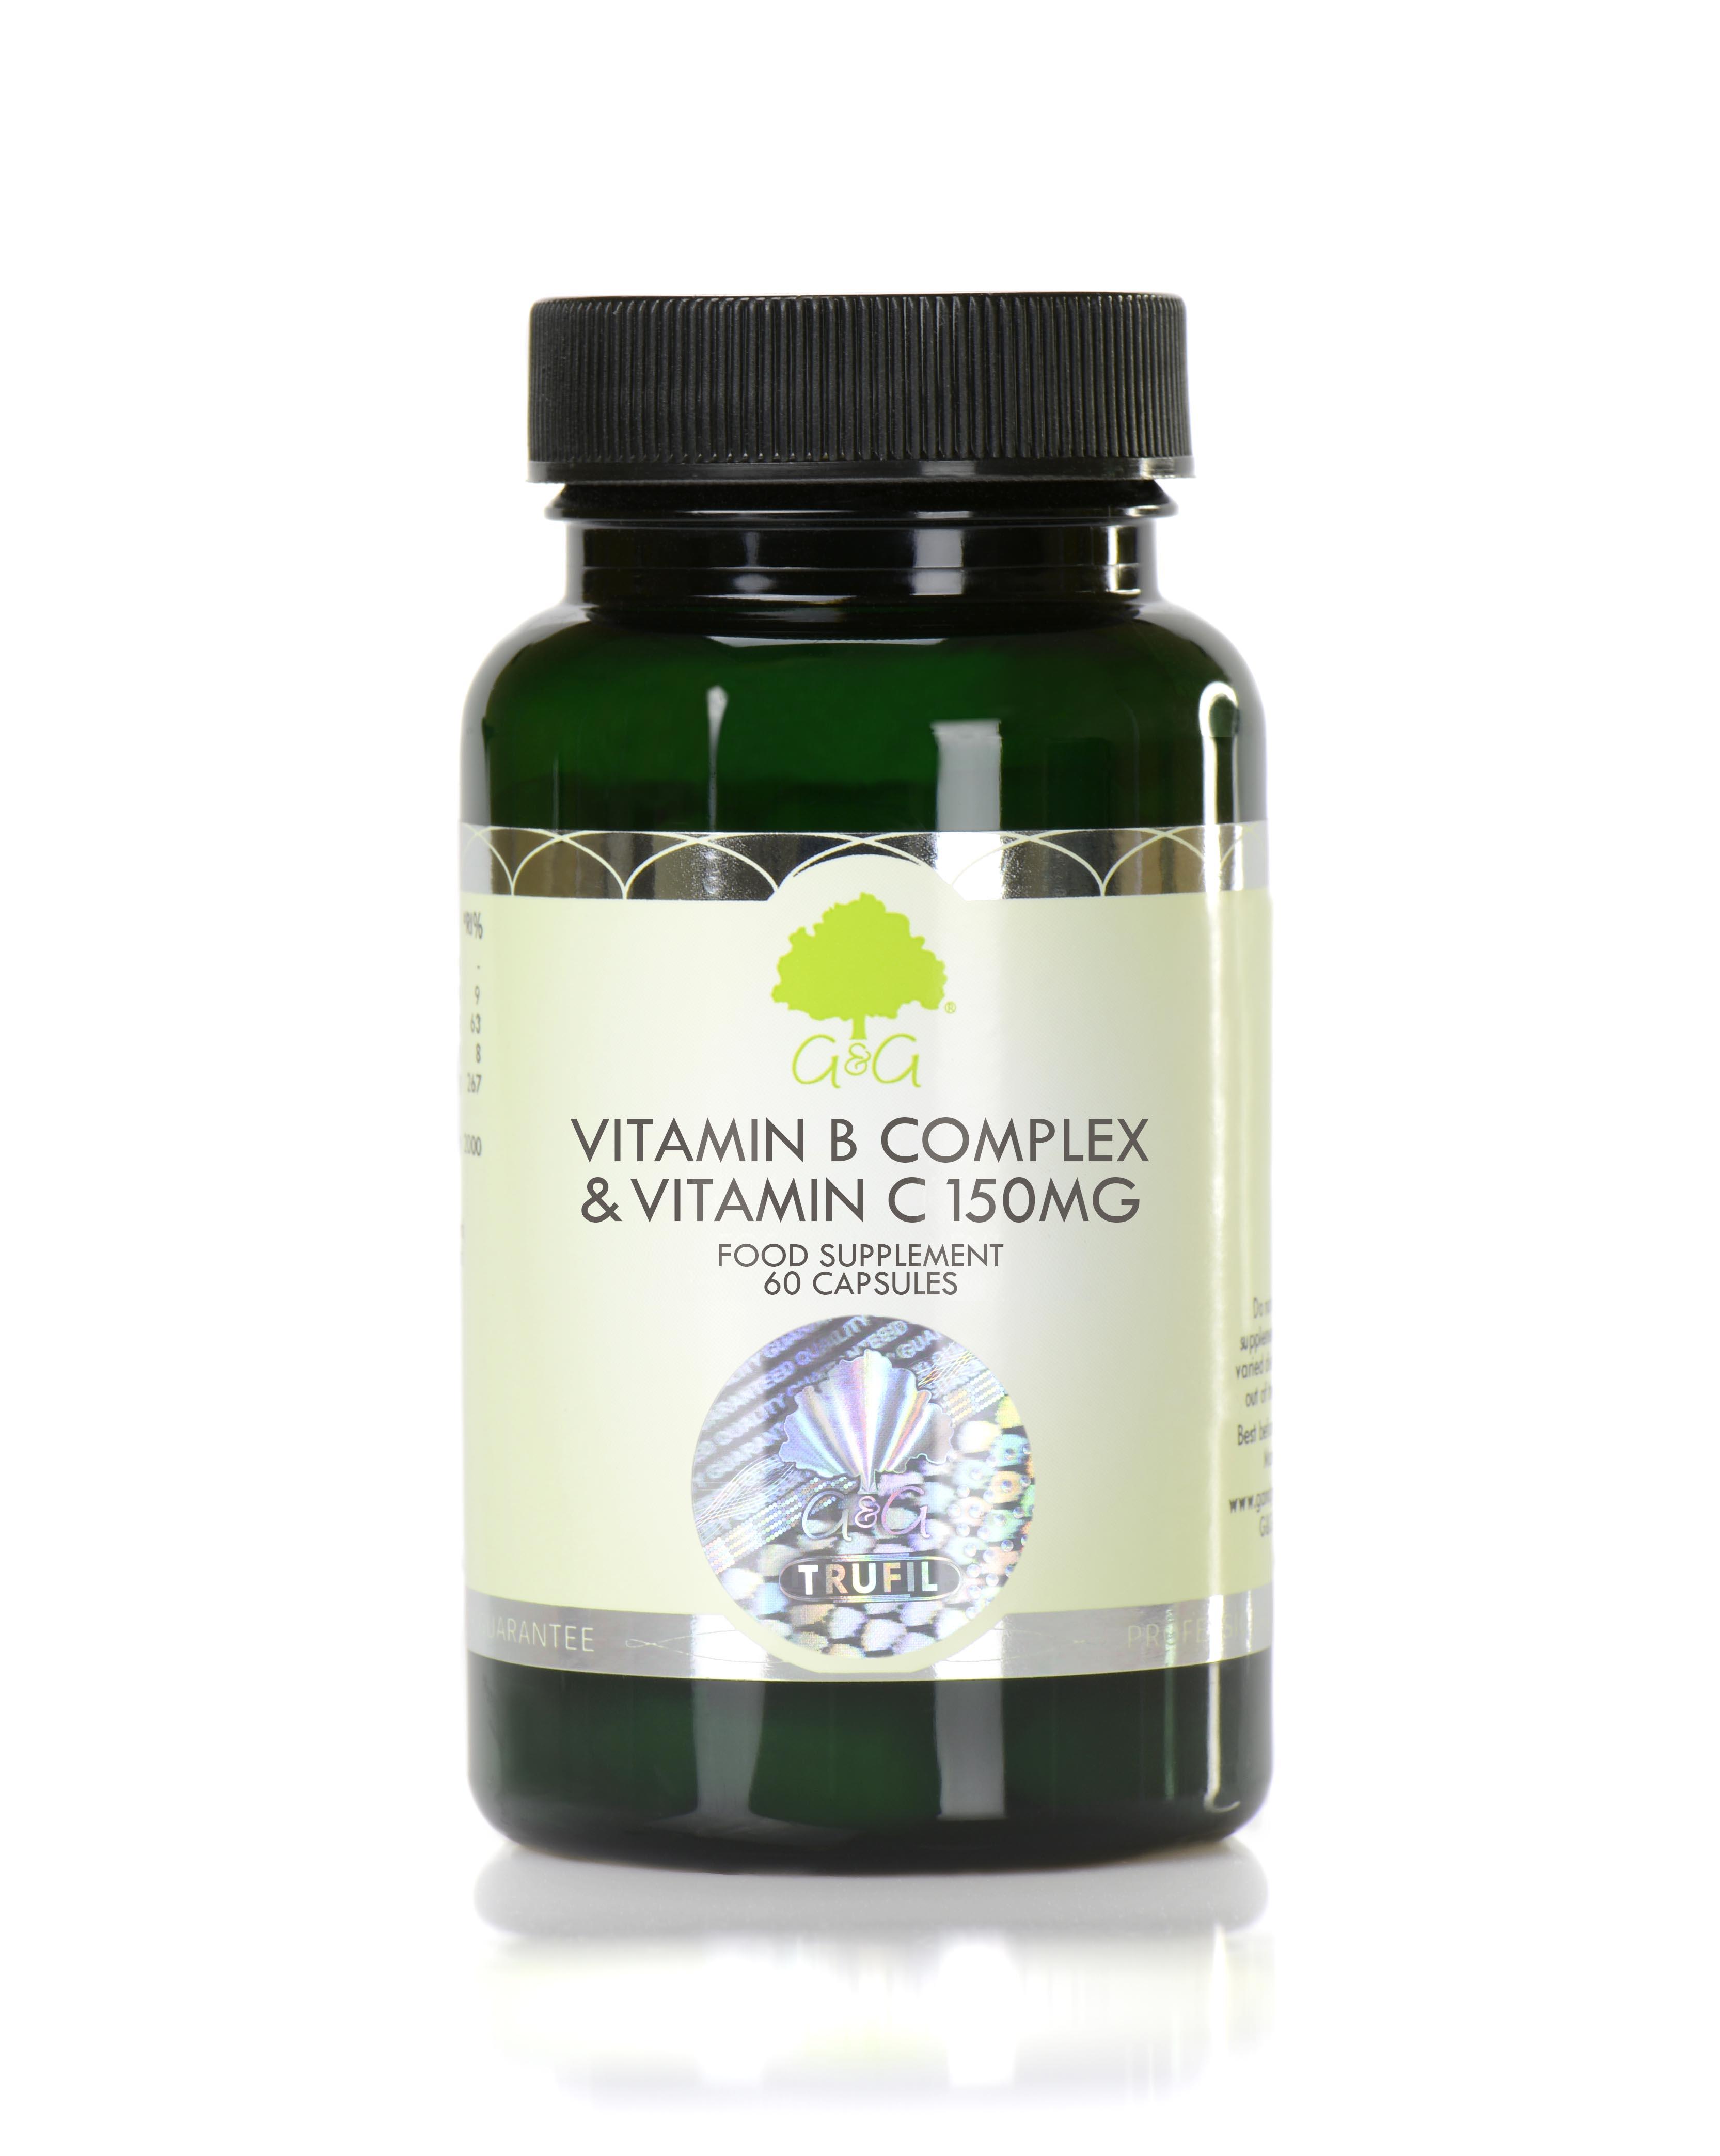 Vitamin B Complex with Vitamin C (150mg) 60's